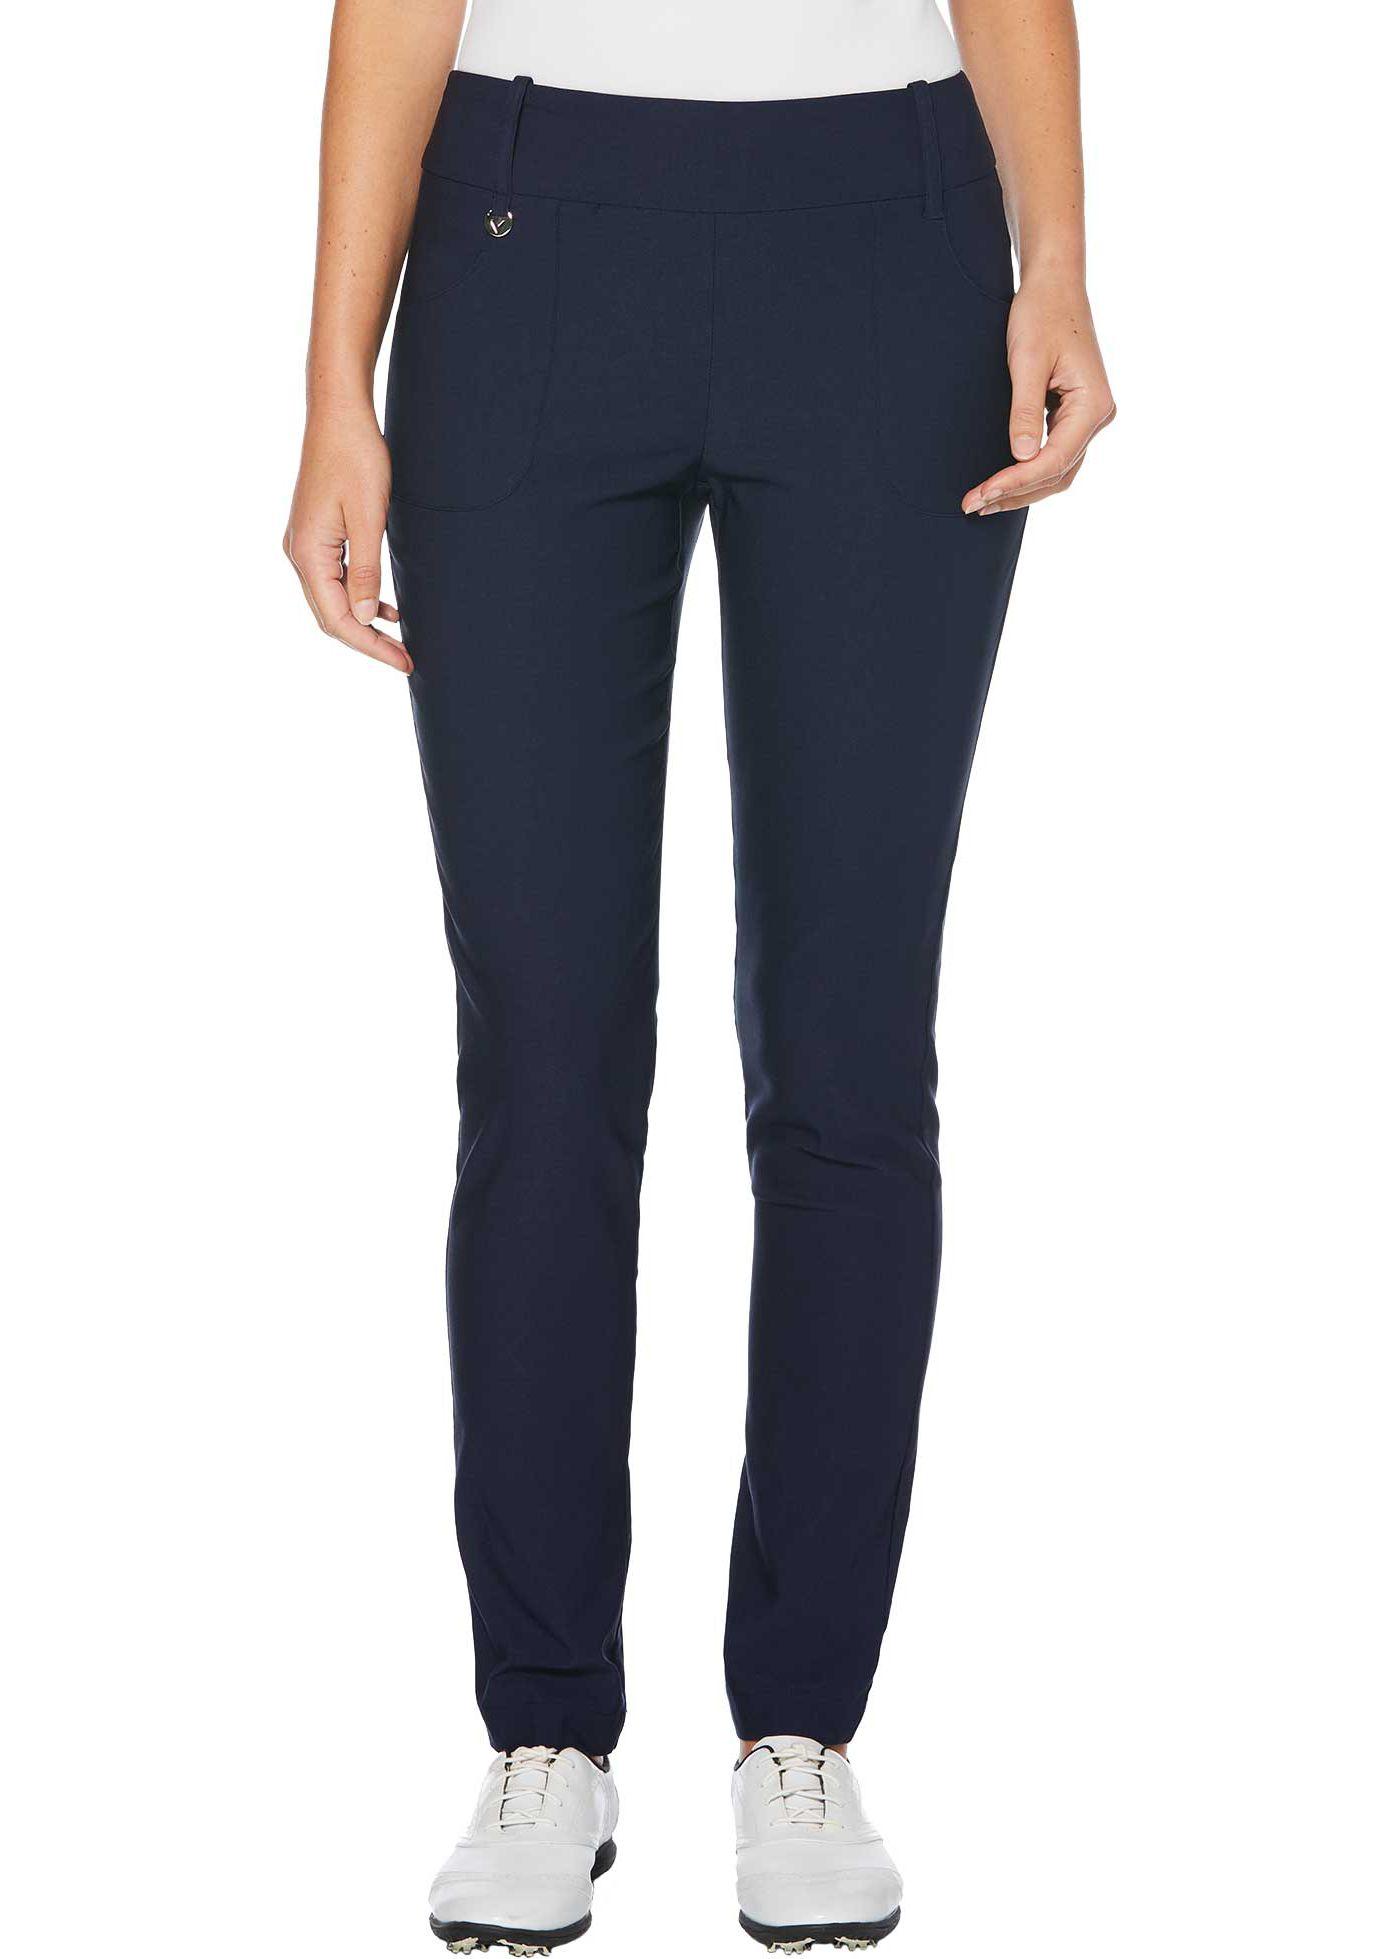 Callaway Women's Tech Stretch Solid Golf Pants